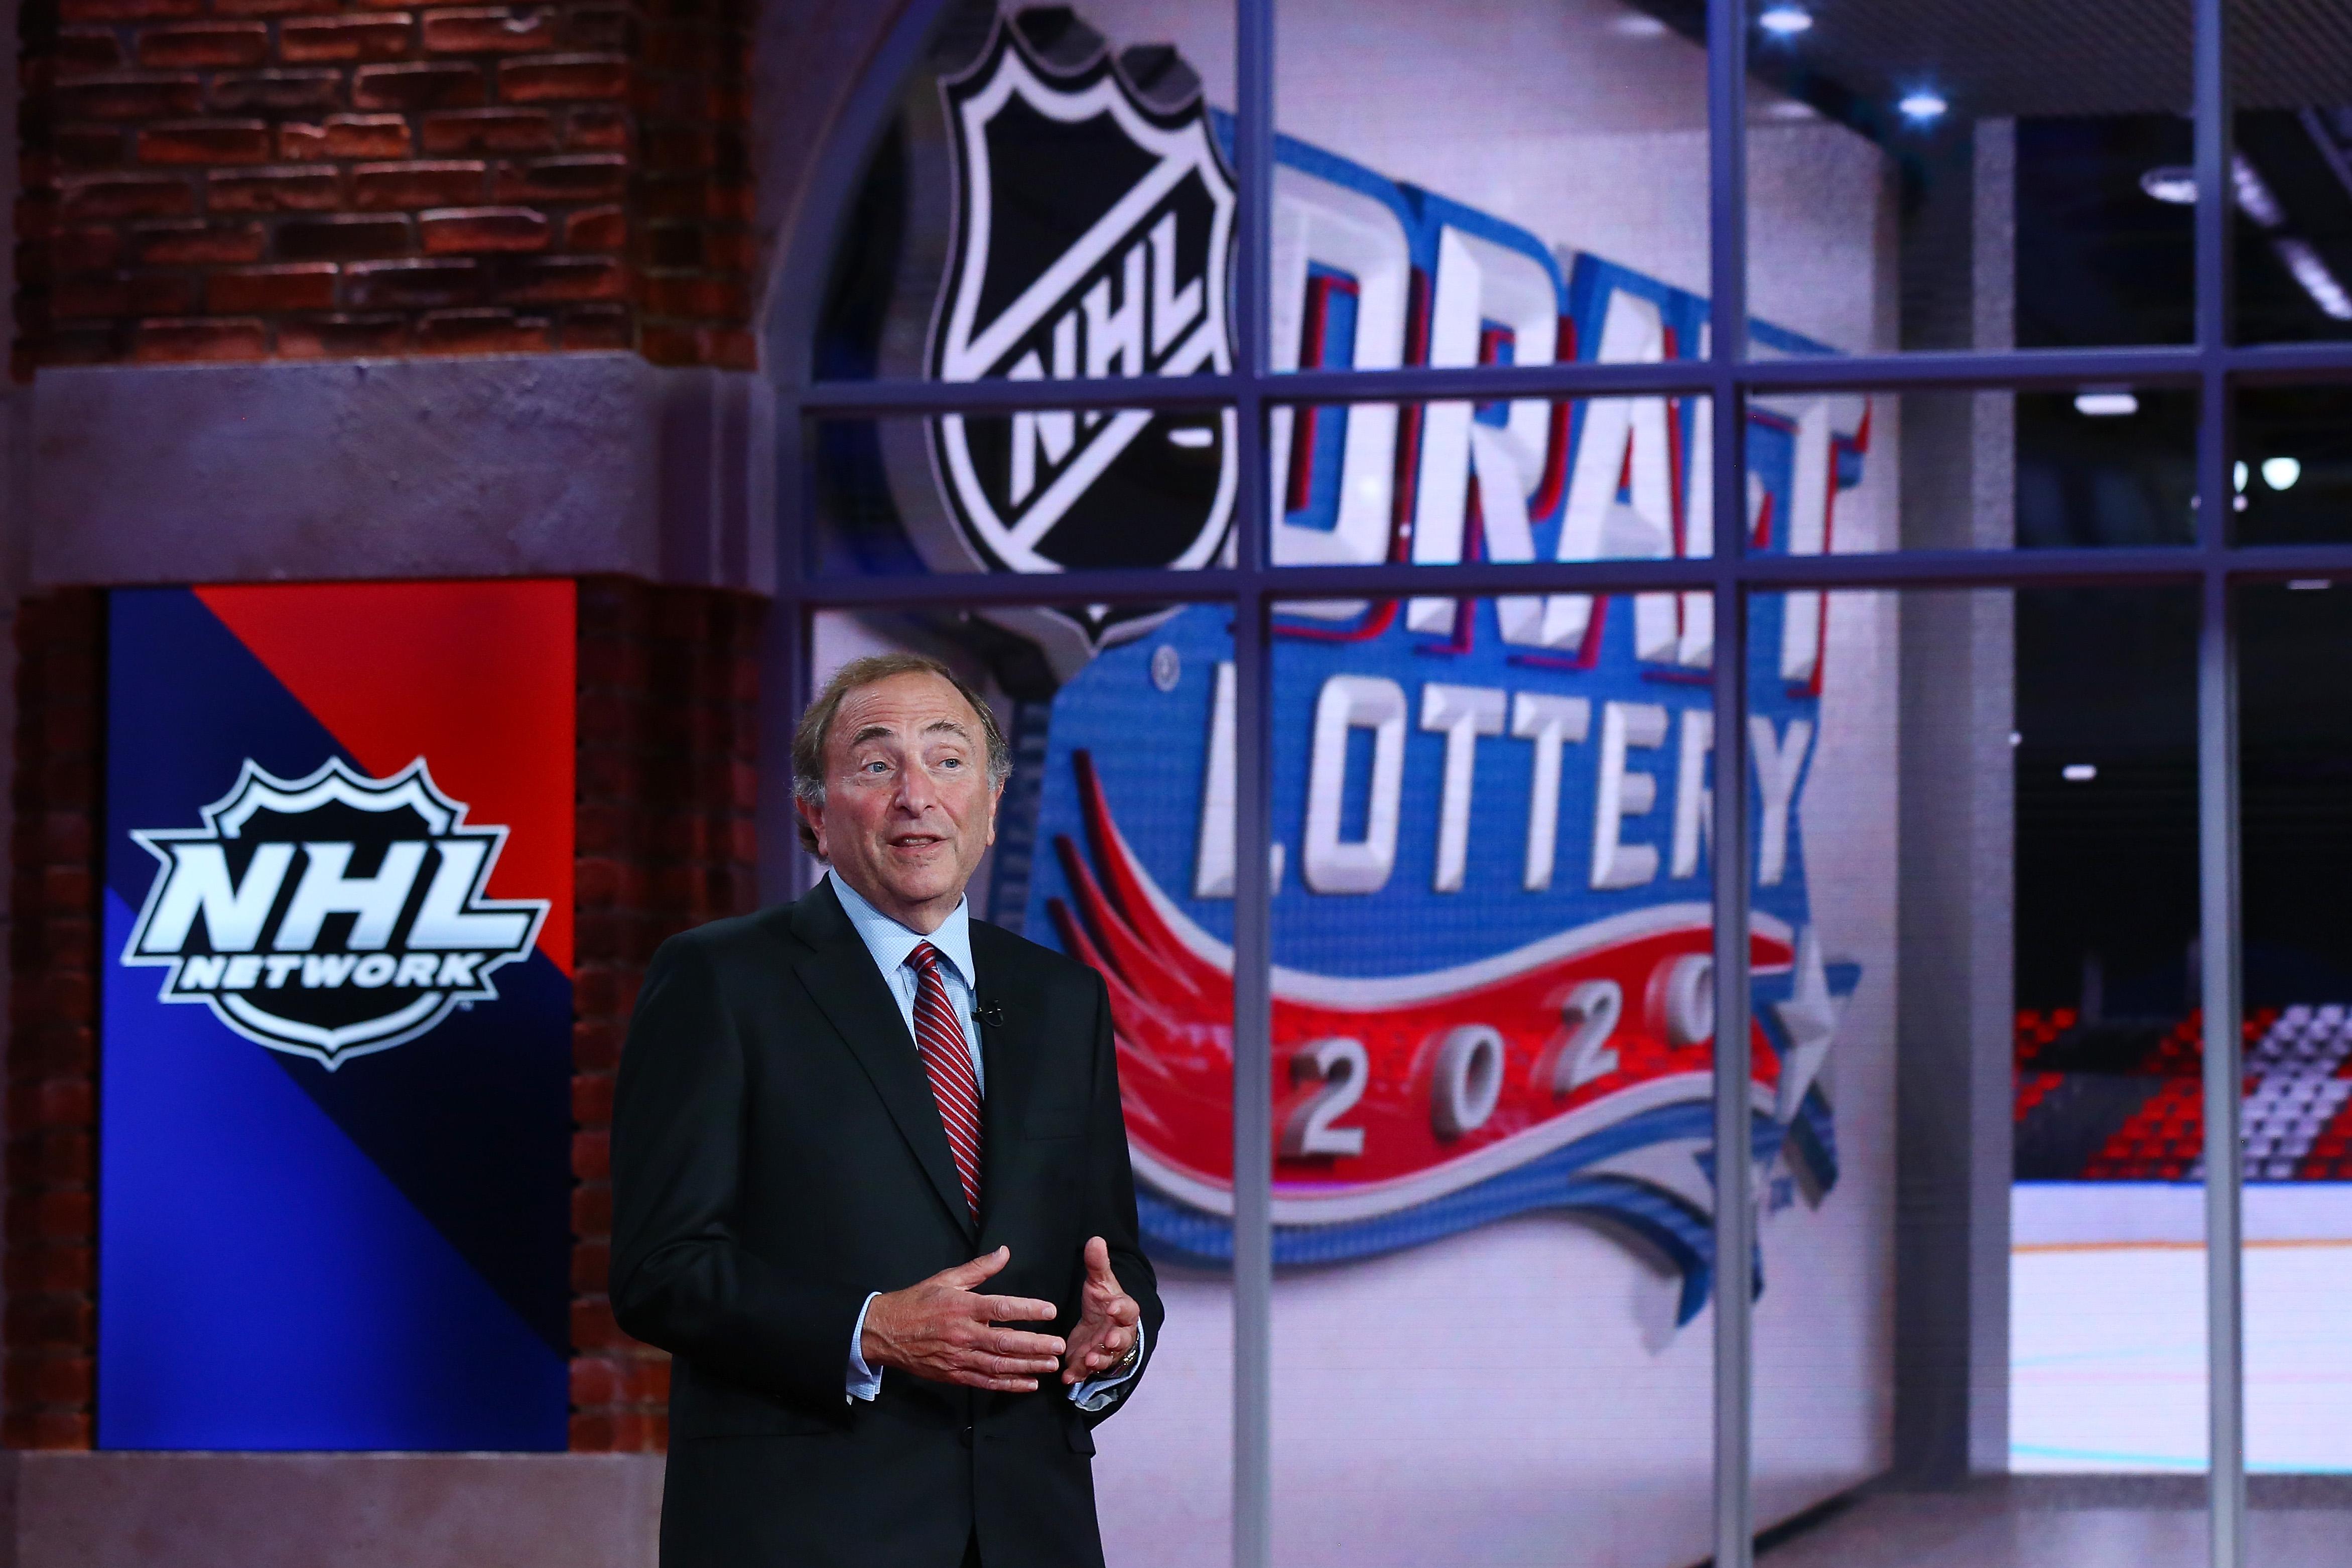 2020 NHL Draft Lottery Phase 2